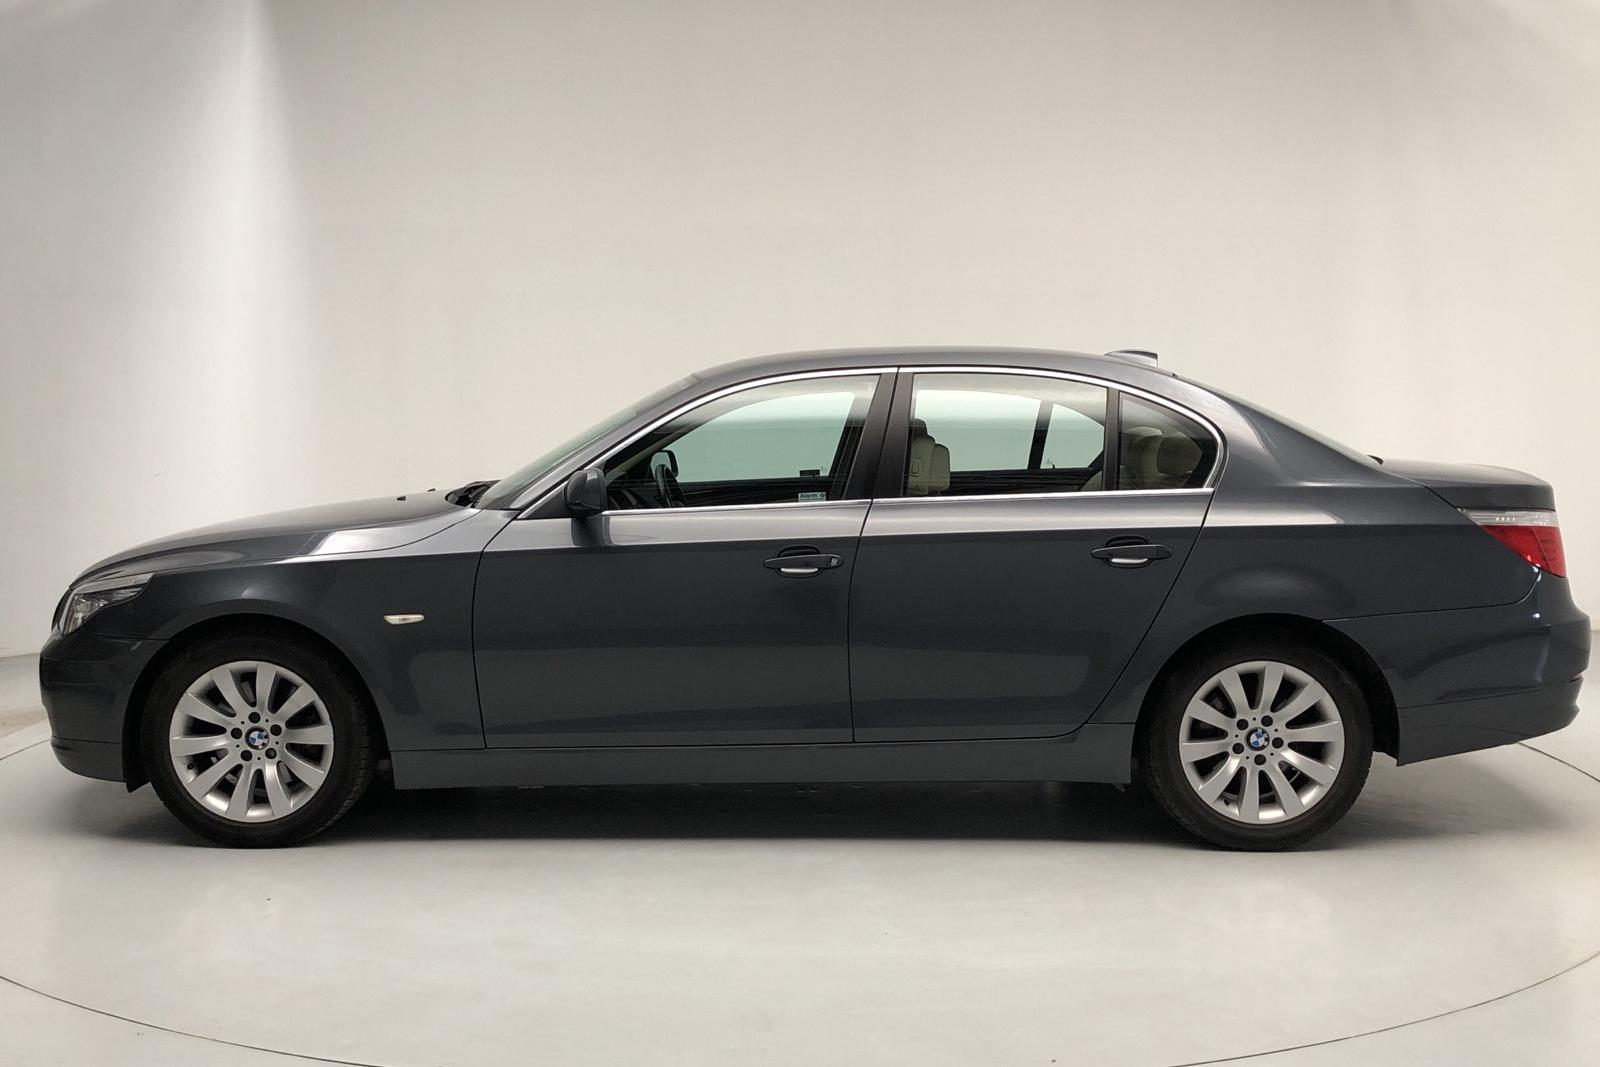 BMW 520d Sedan, E60 (177hk) - 108 000 km - Manual - gray - 2009